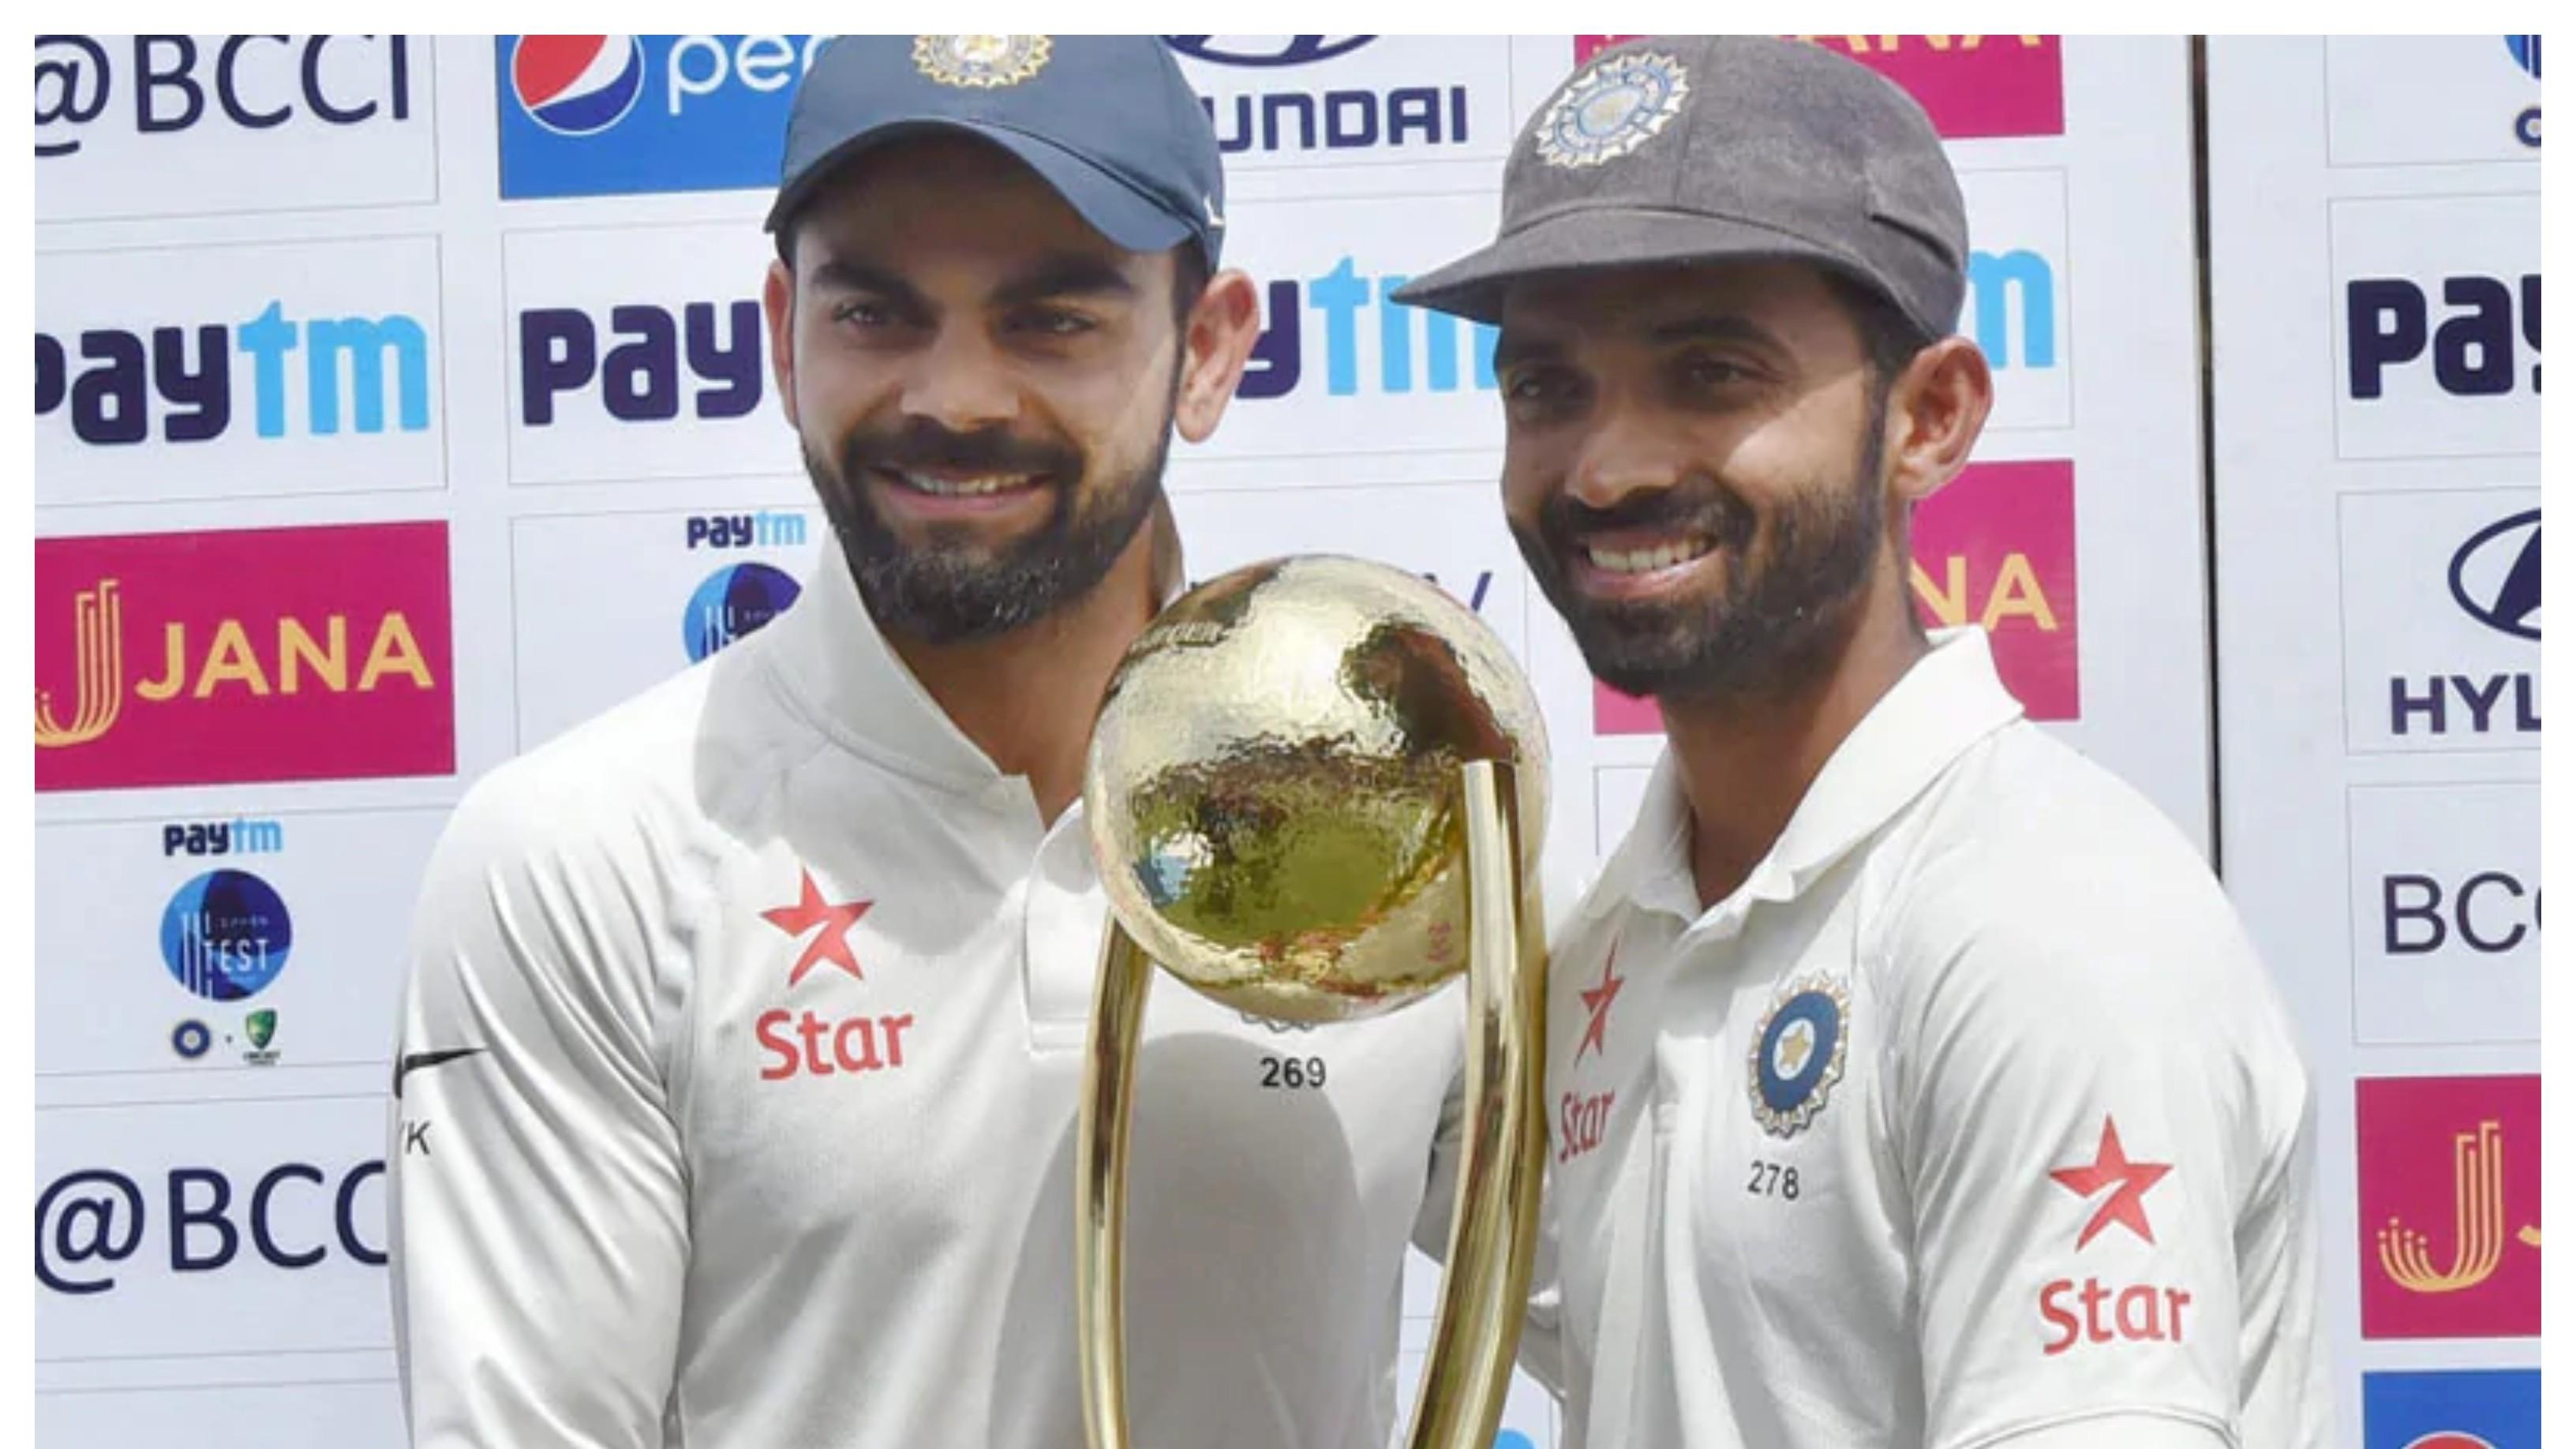 'Virat informed me he isn't fit enough', Rahane recalls captaining India in 2017 Dharamsala Test